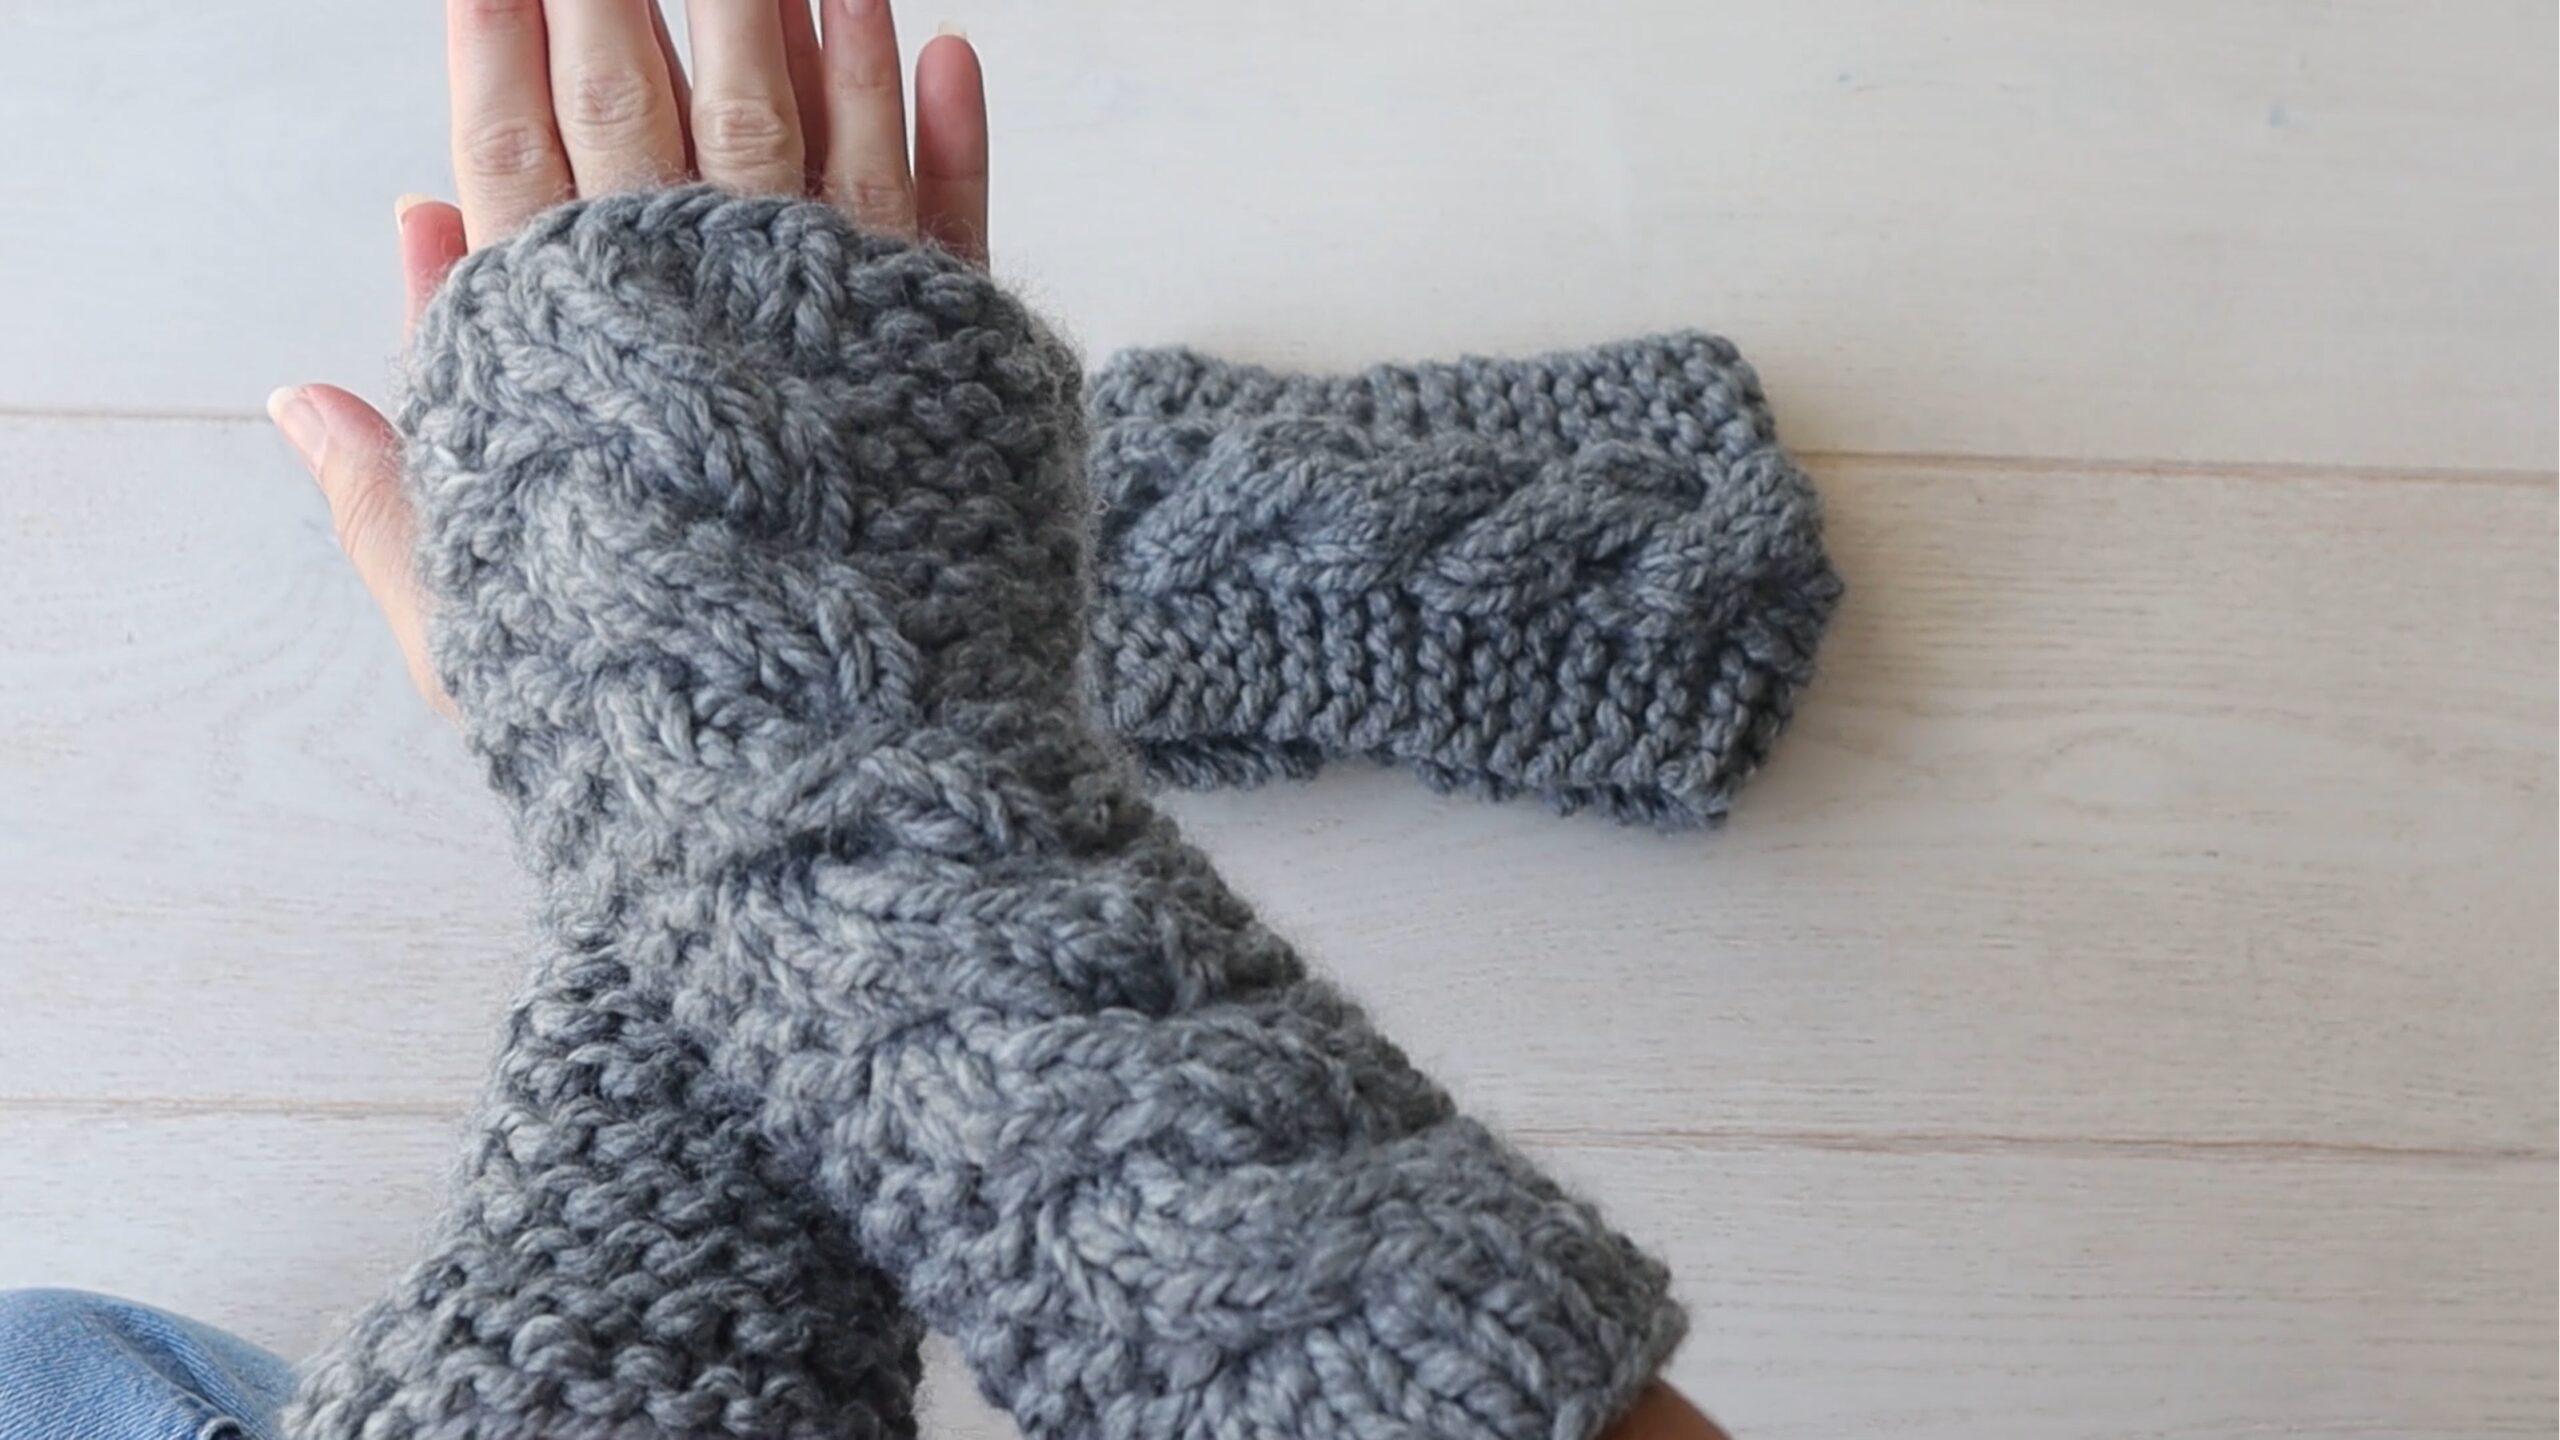 gants sans doigts en tricot torsadé